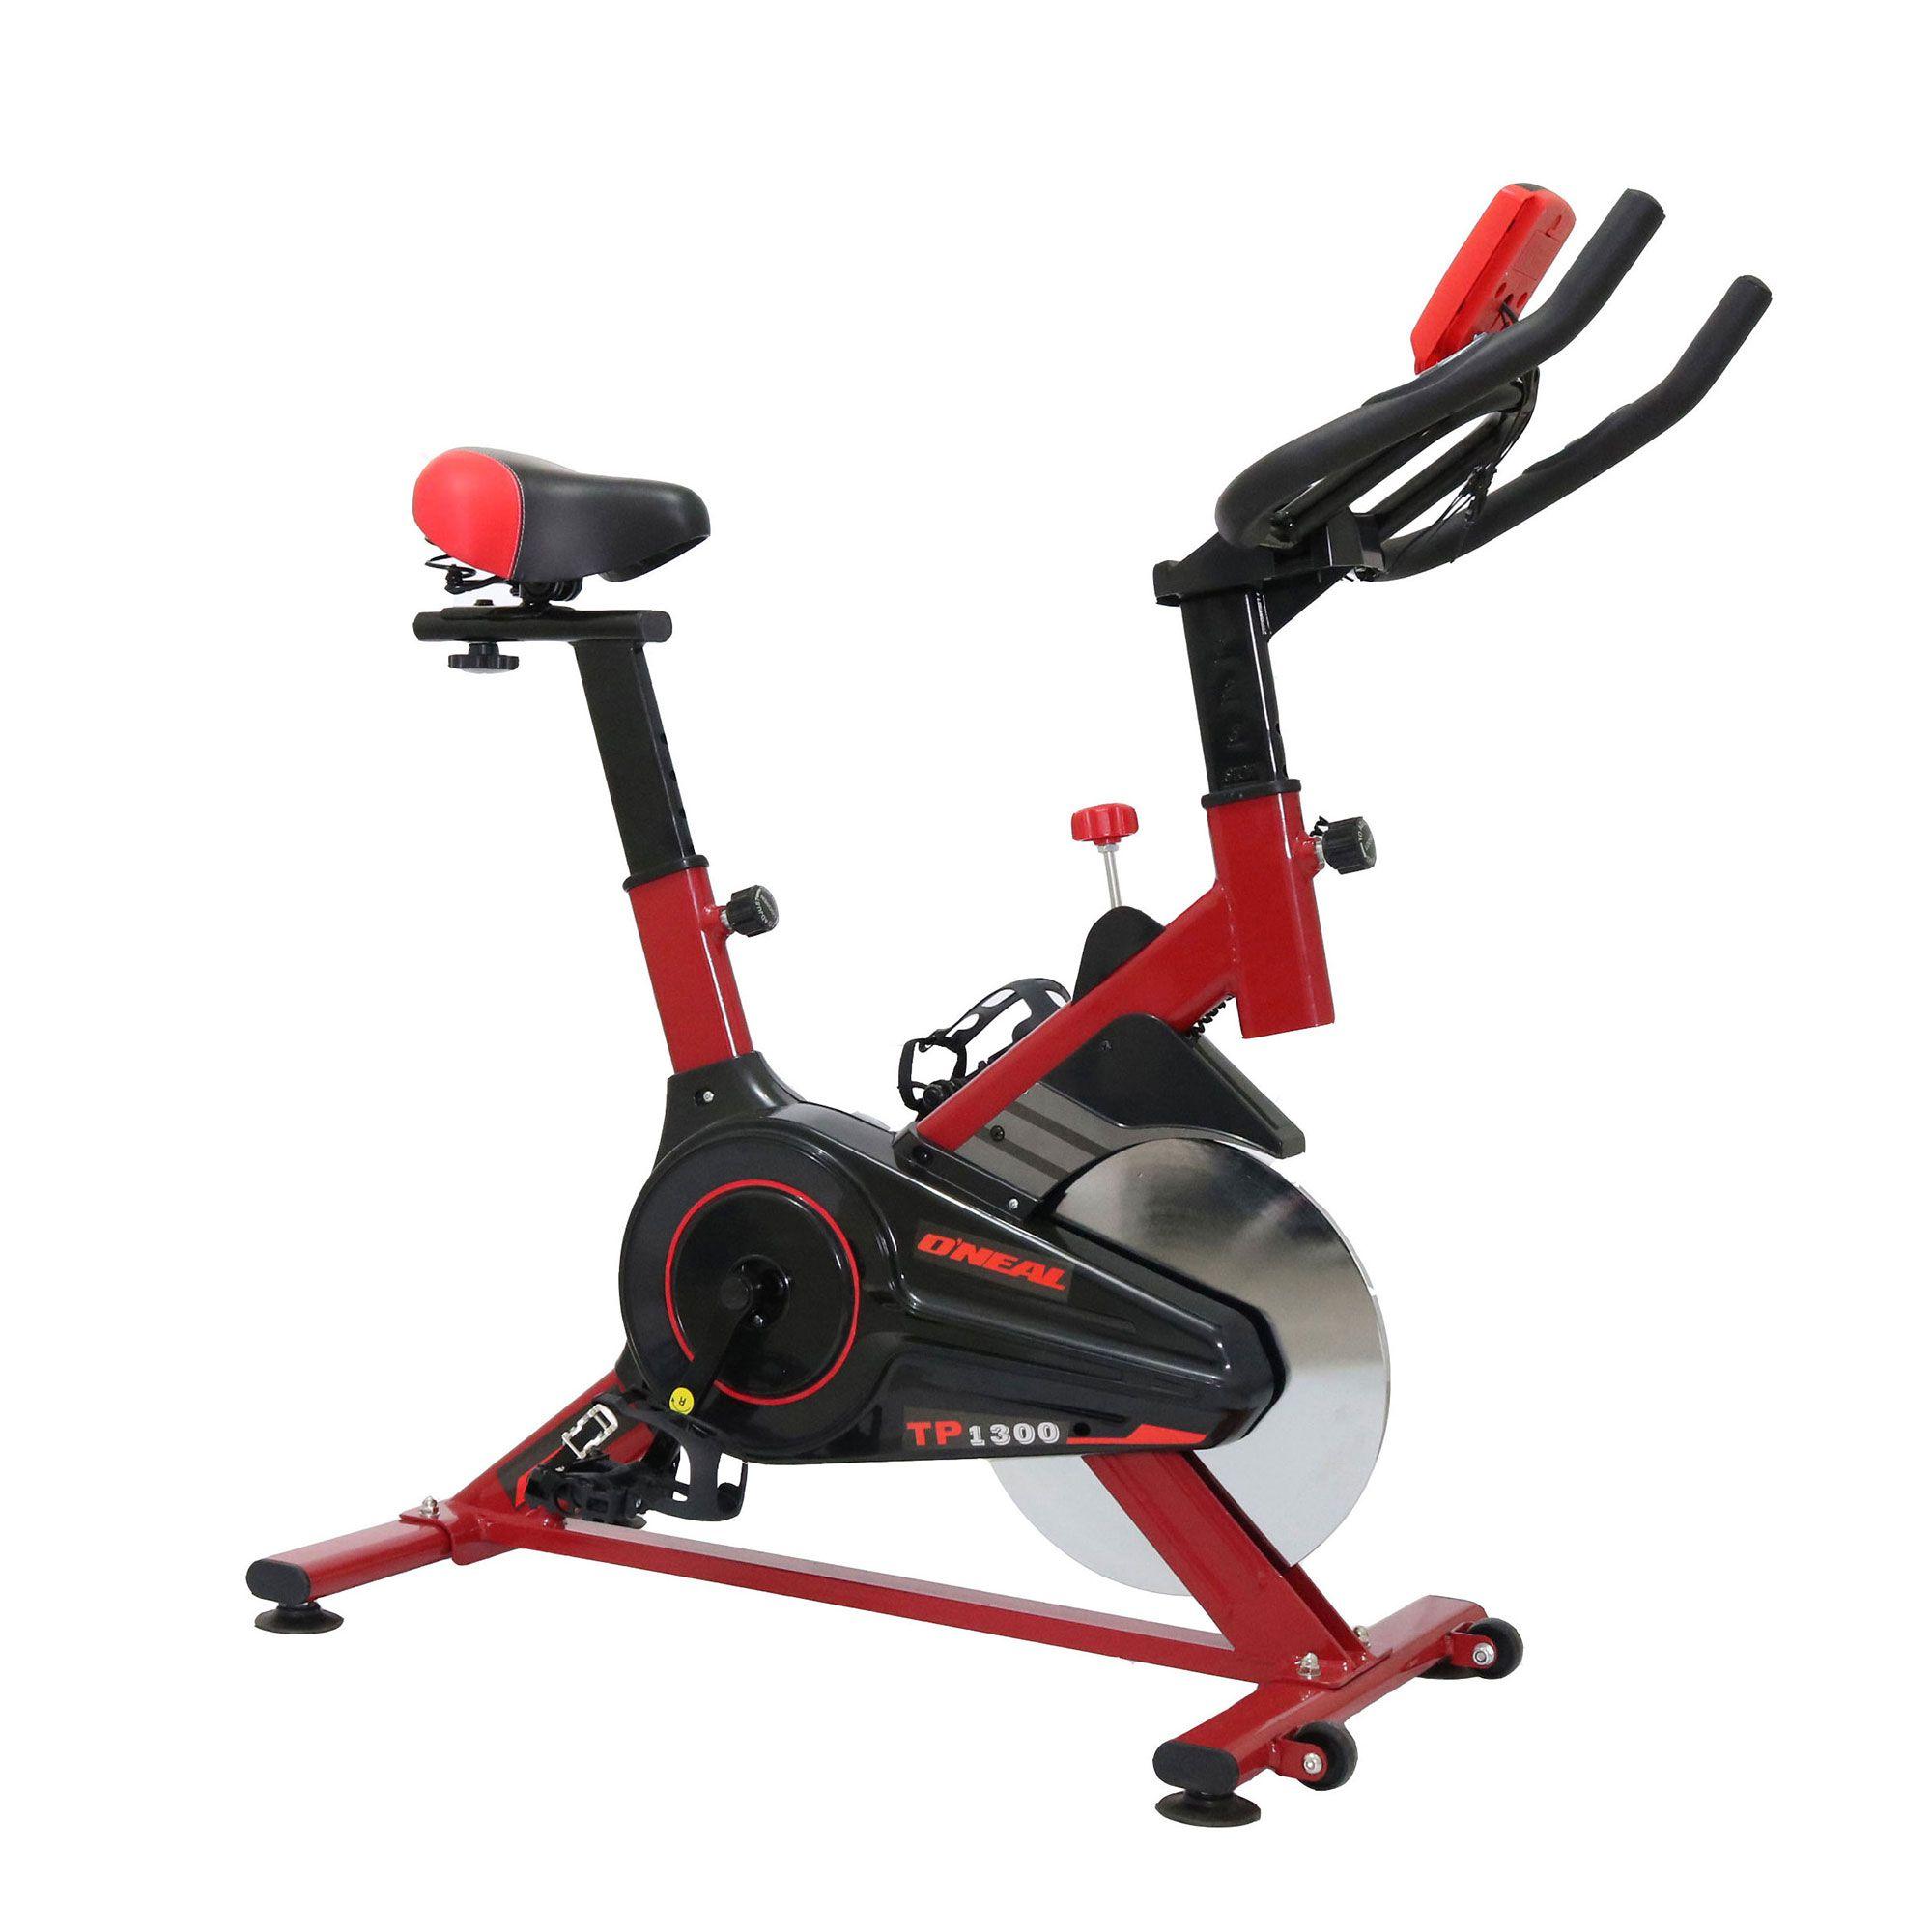 Bicicleta ergometrica spinning vermelha 90kg oneal tp1300